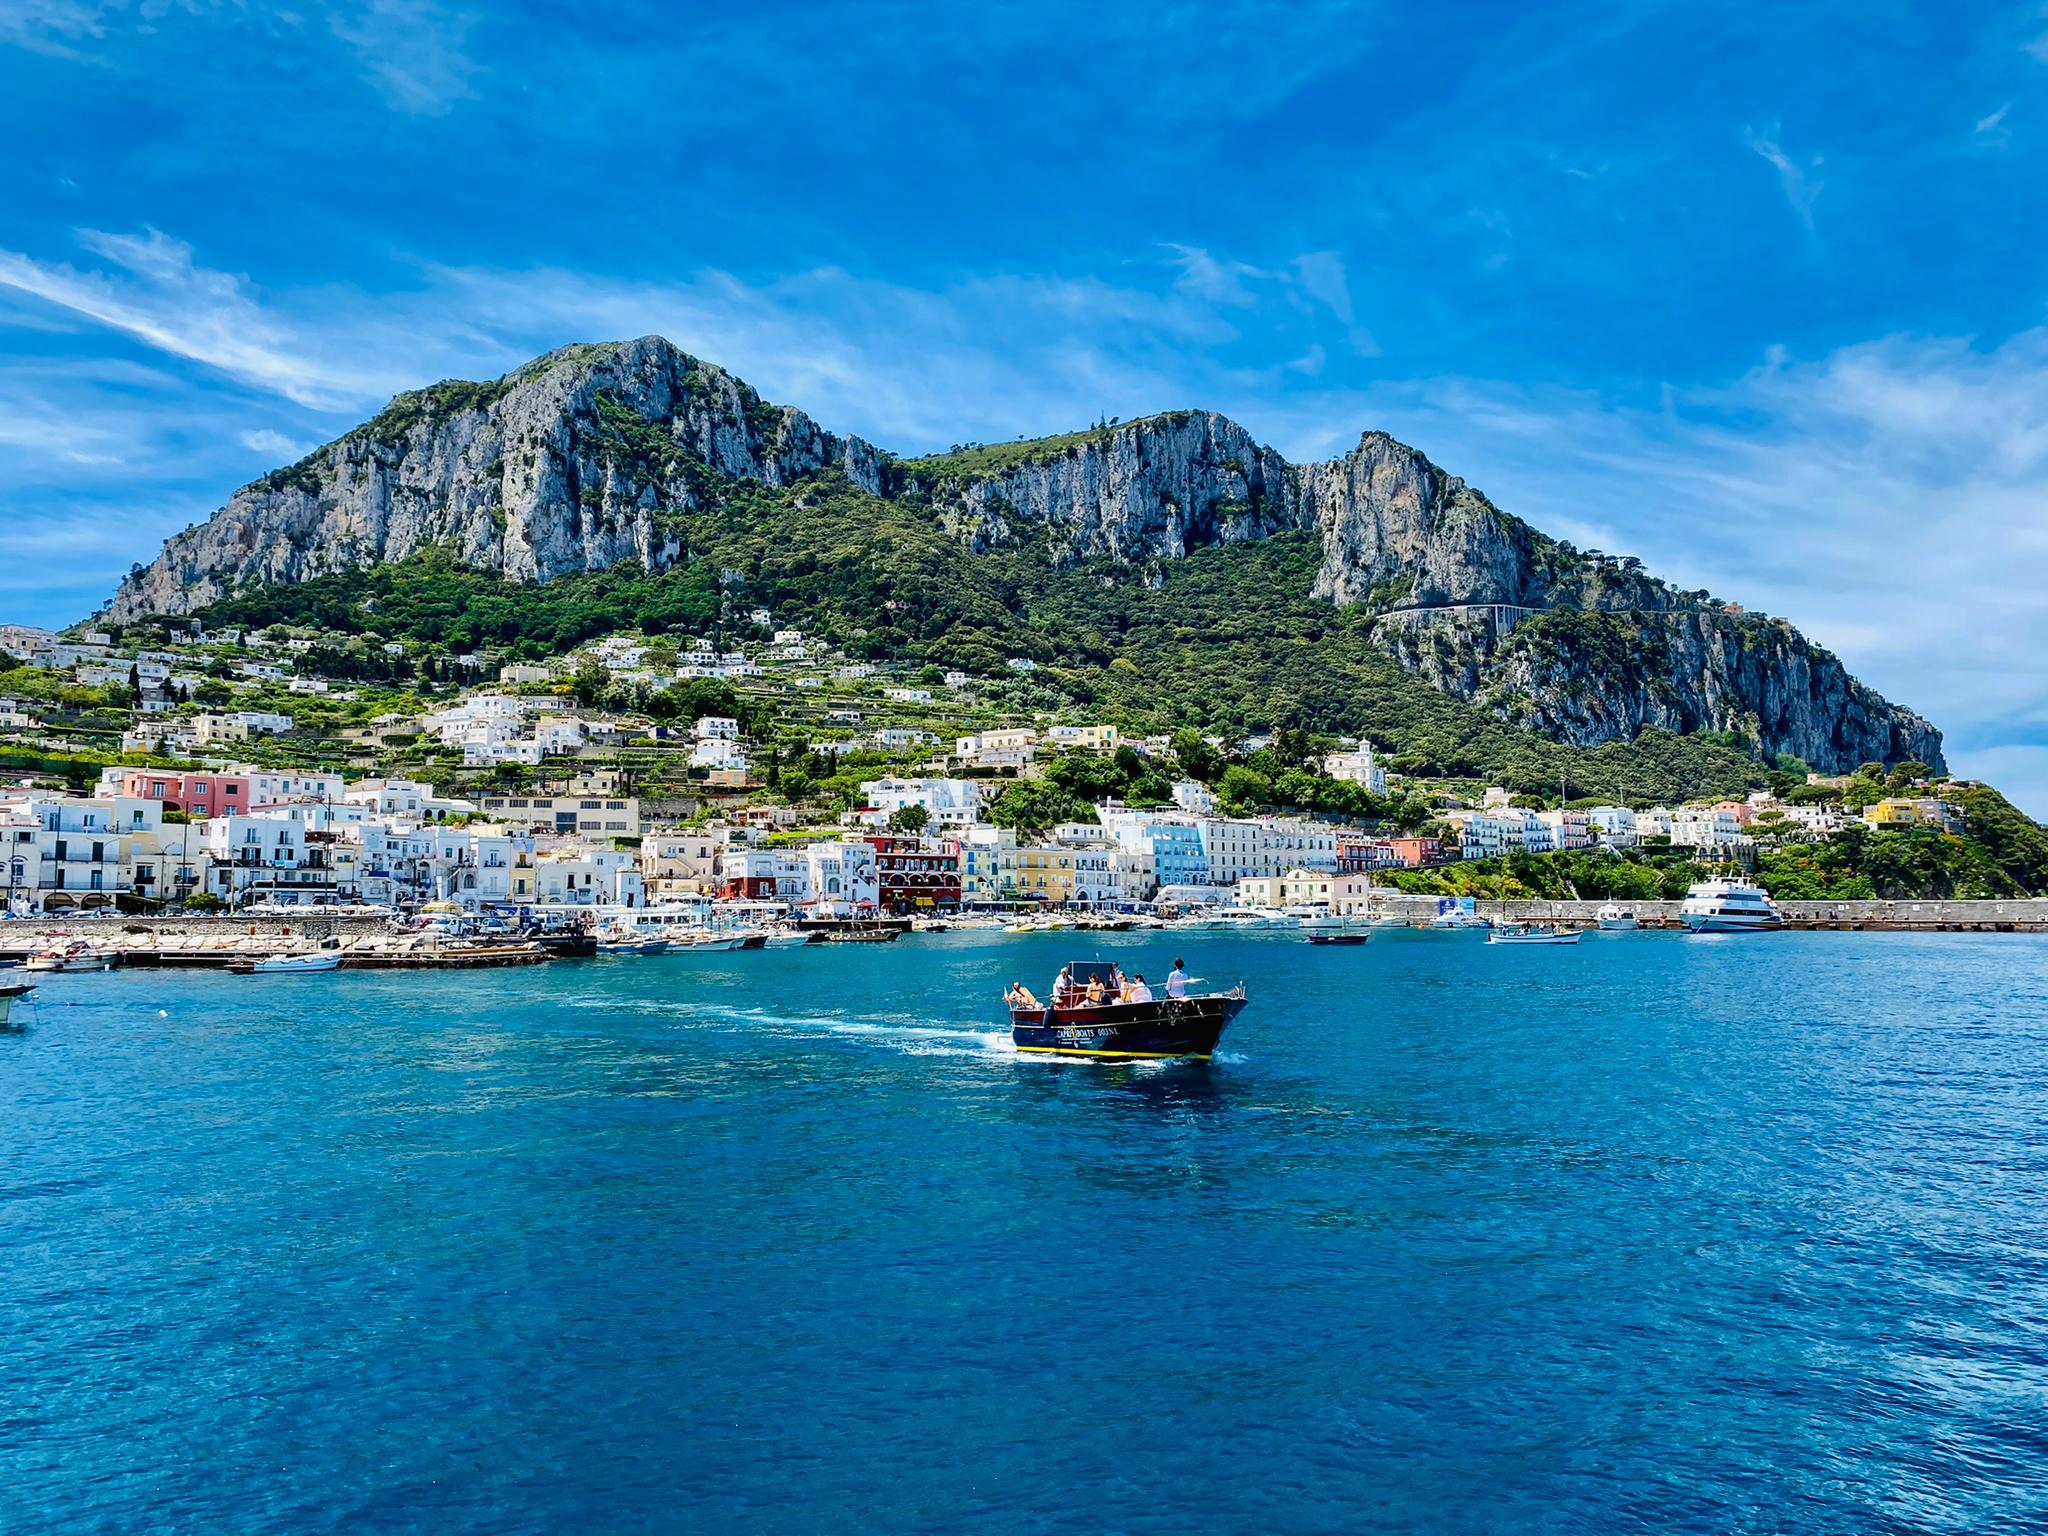 Einfahrt in Capri